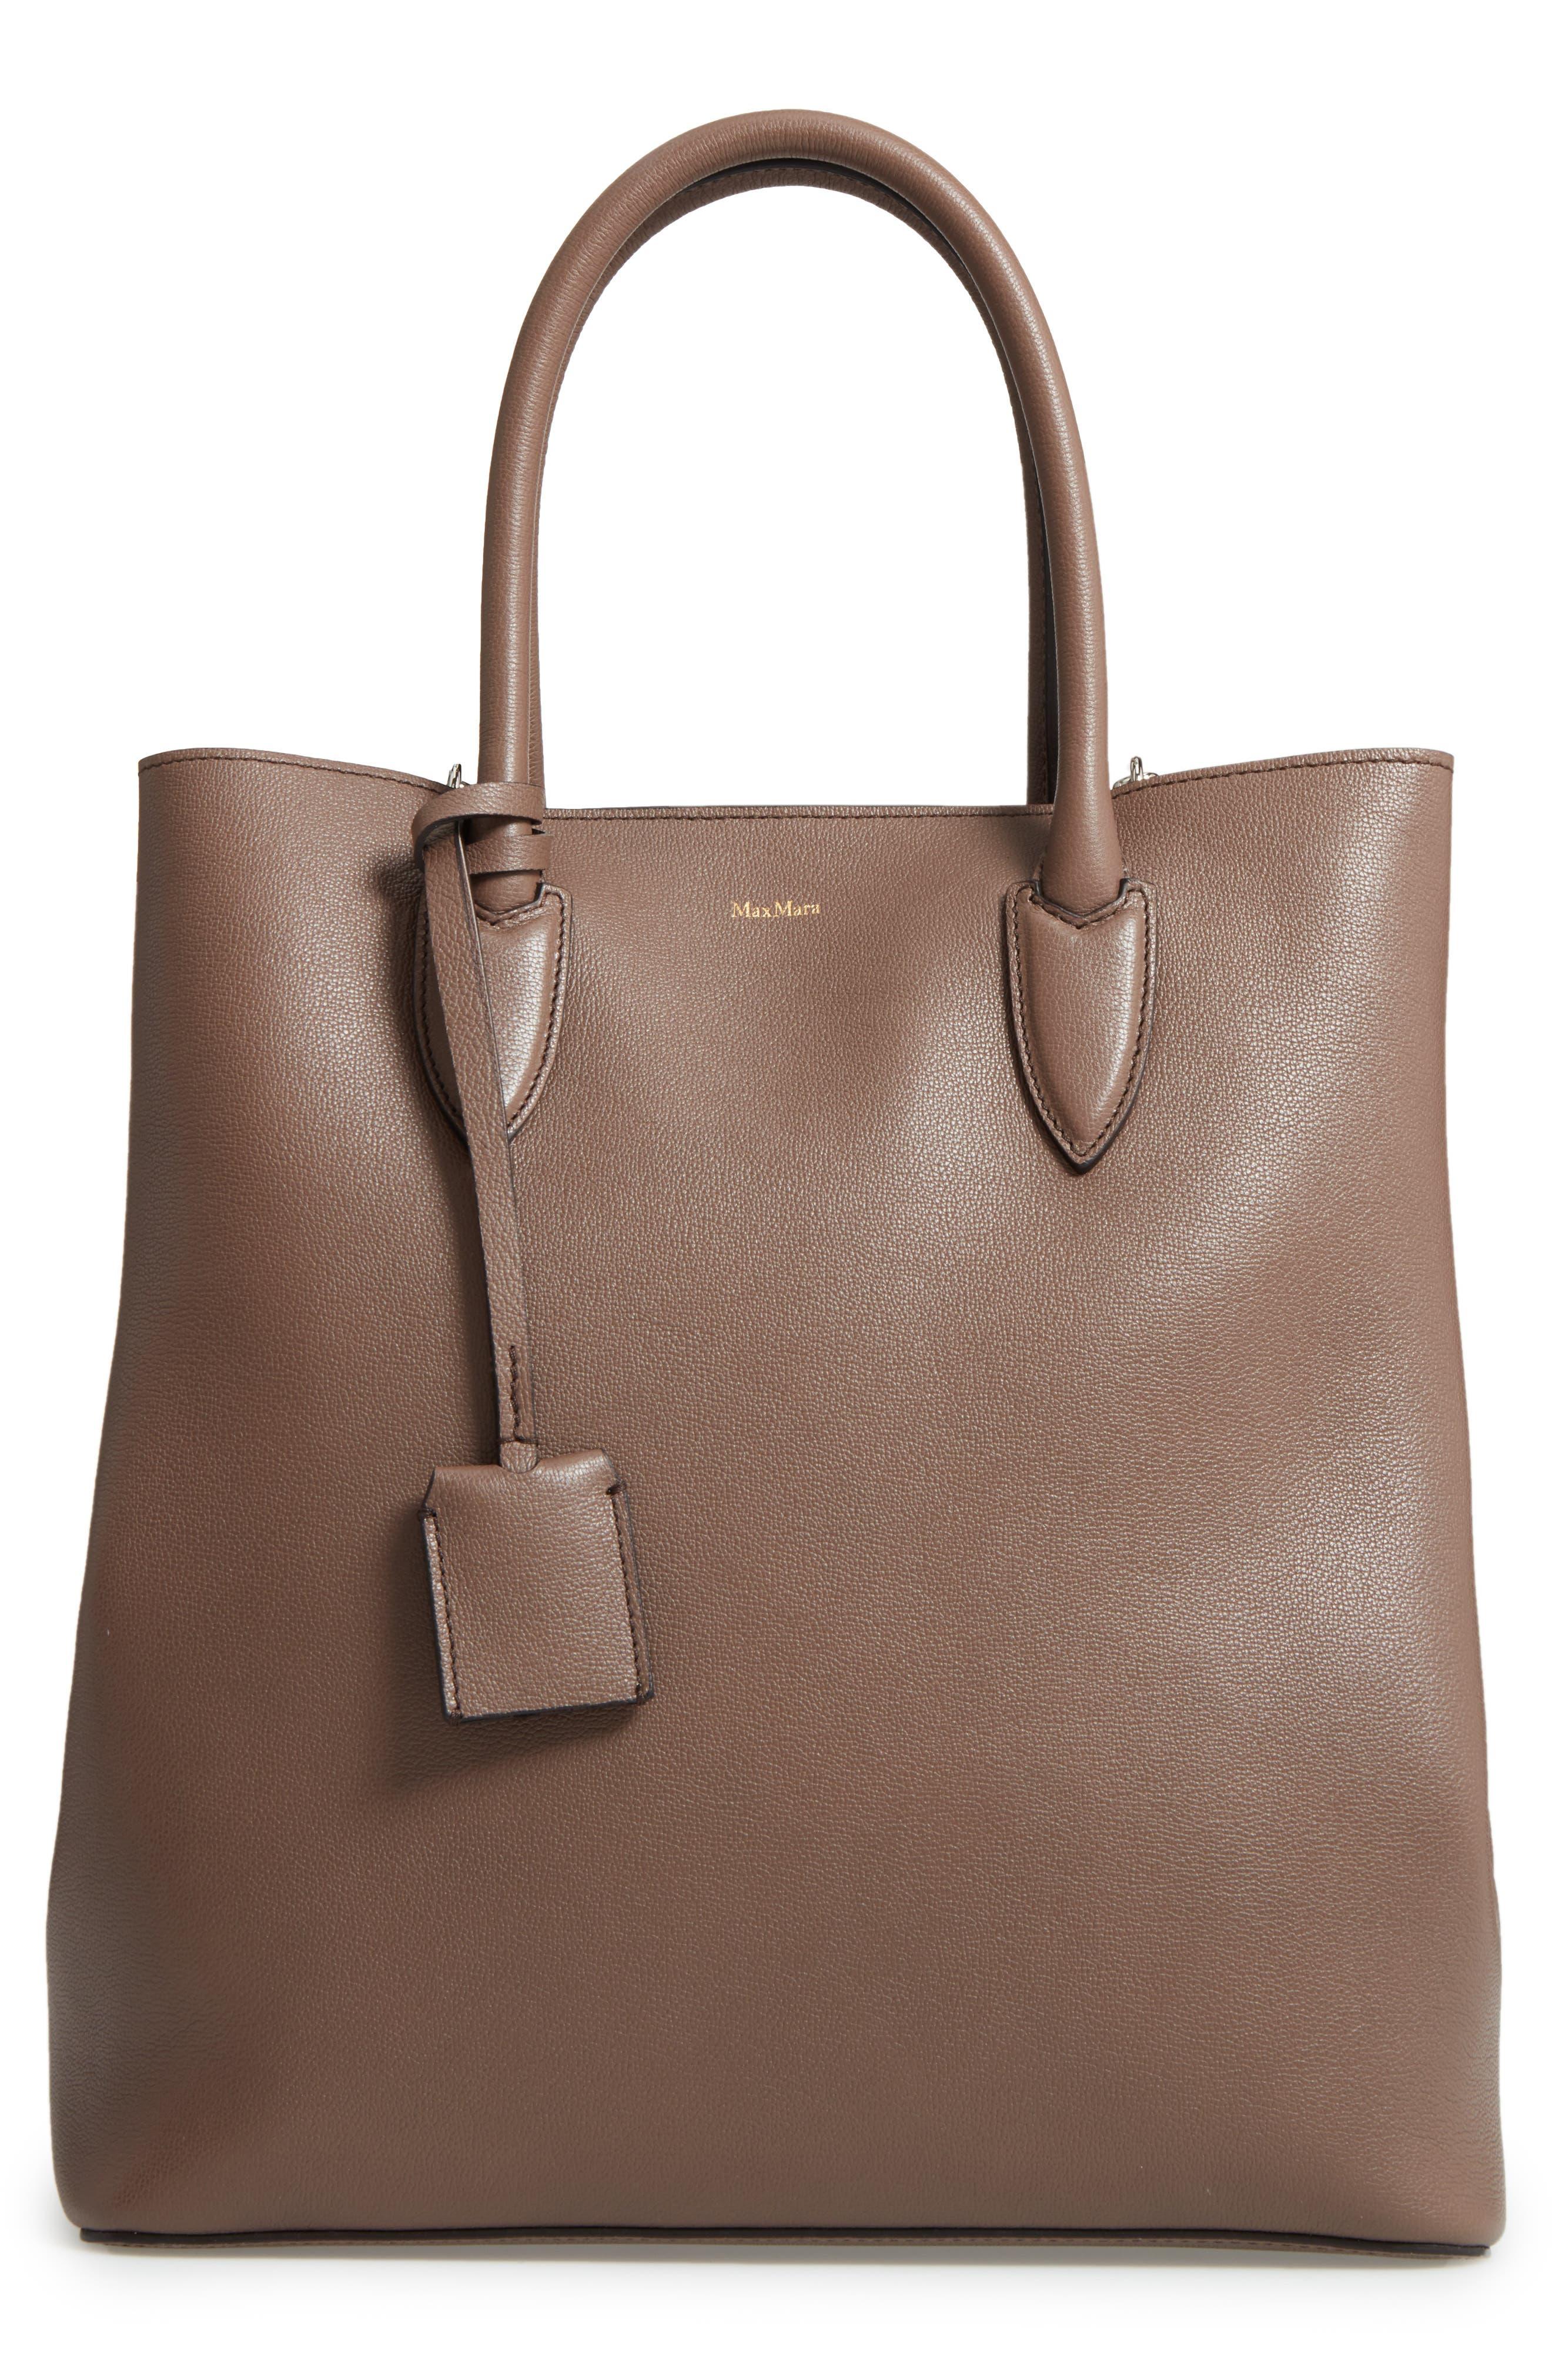 Alternate Image 1 Selected - Max Mara Pebbled Leather Shopper